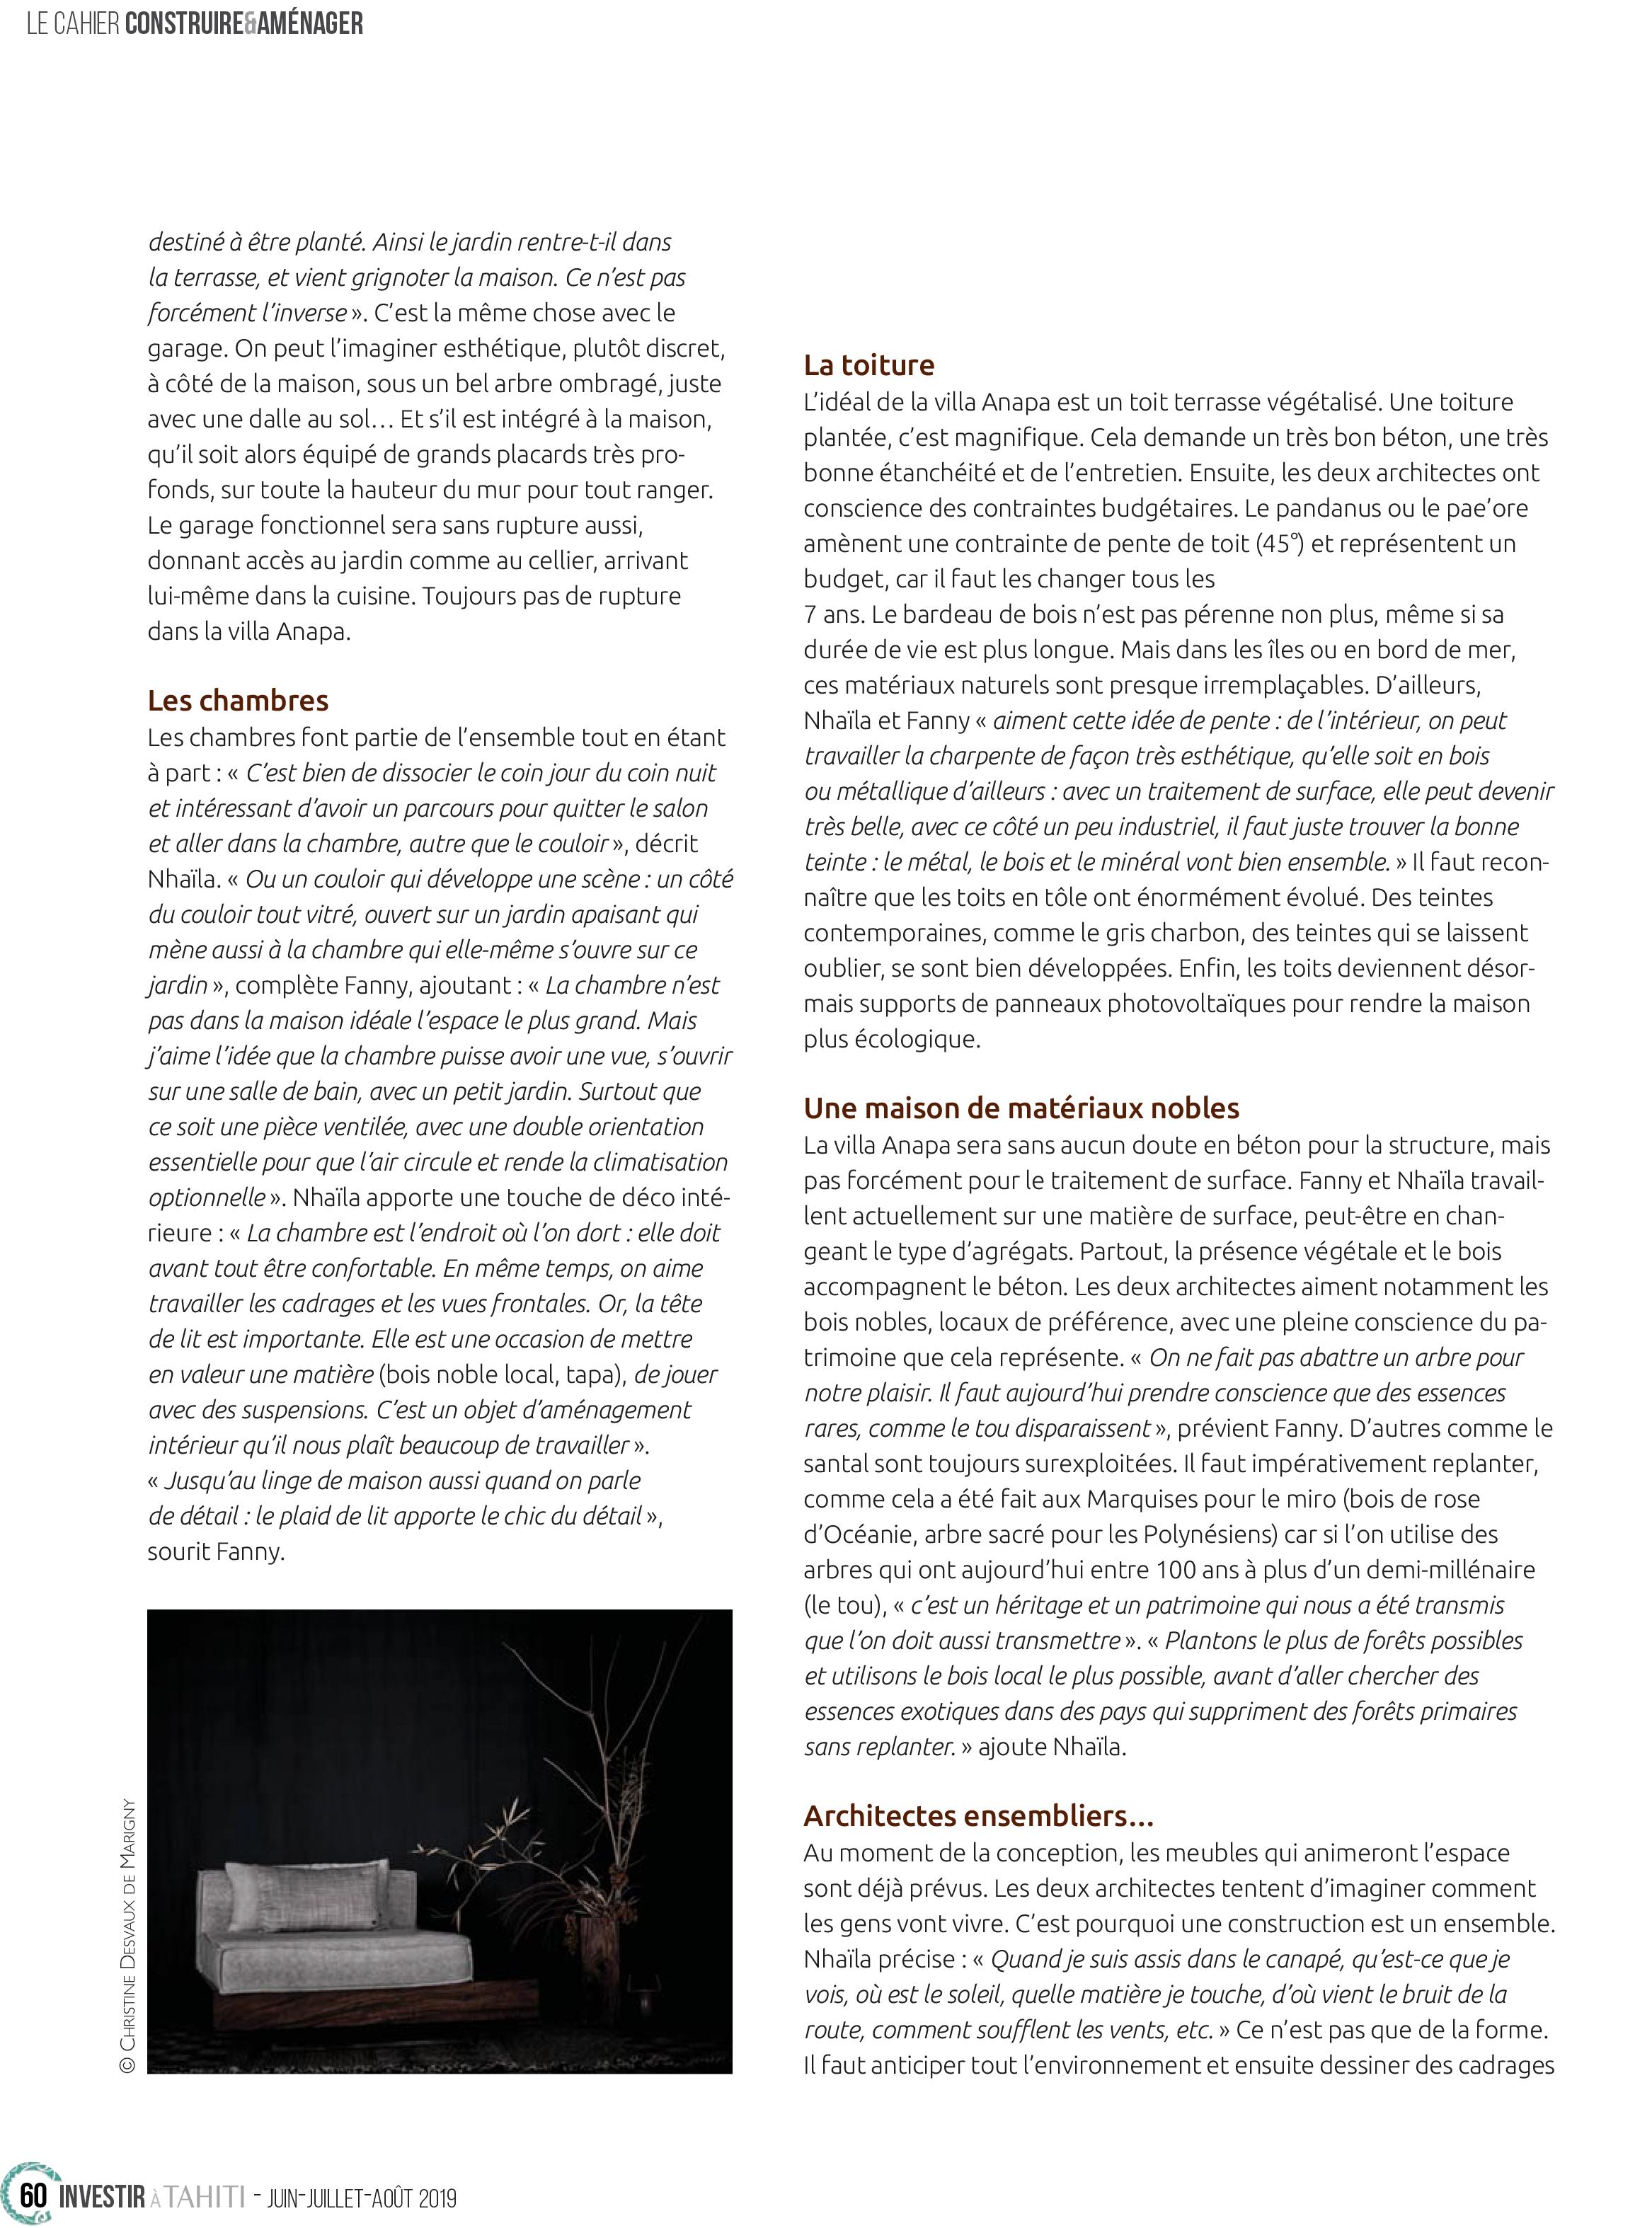 ANAPA-IVT2-8.jpg